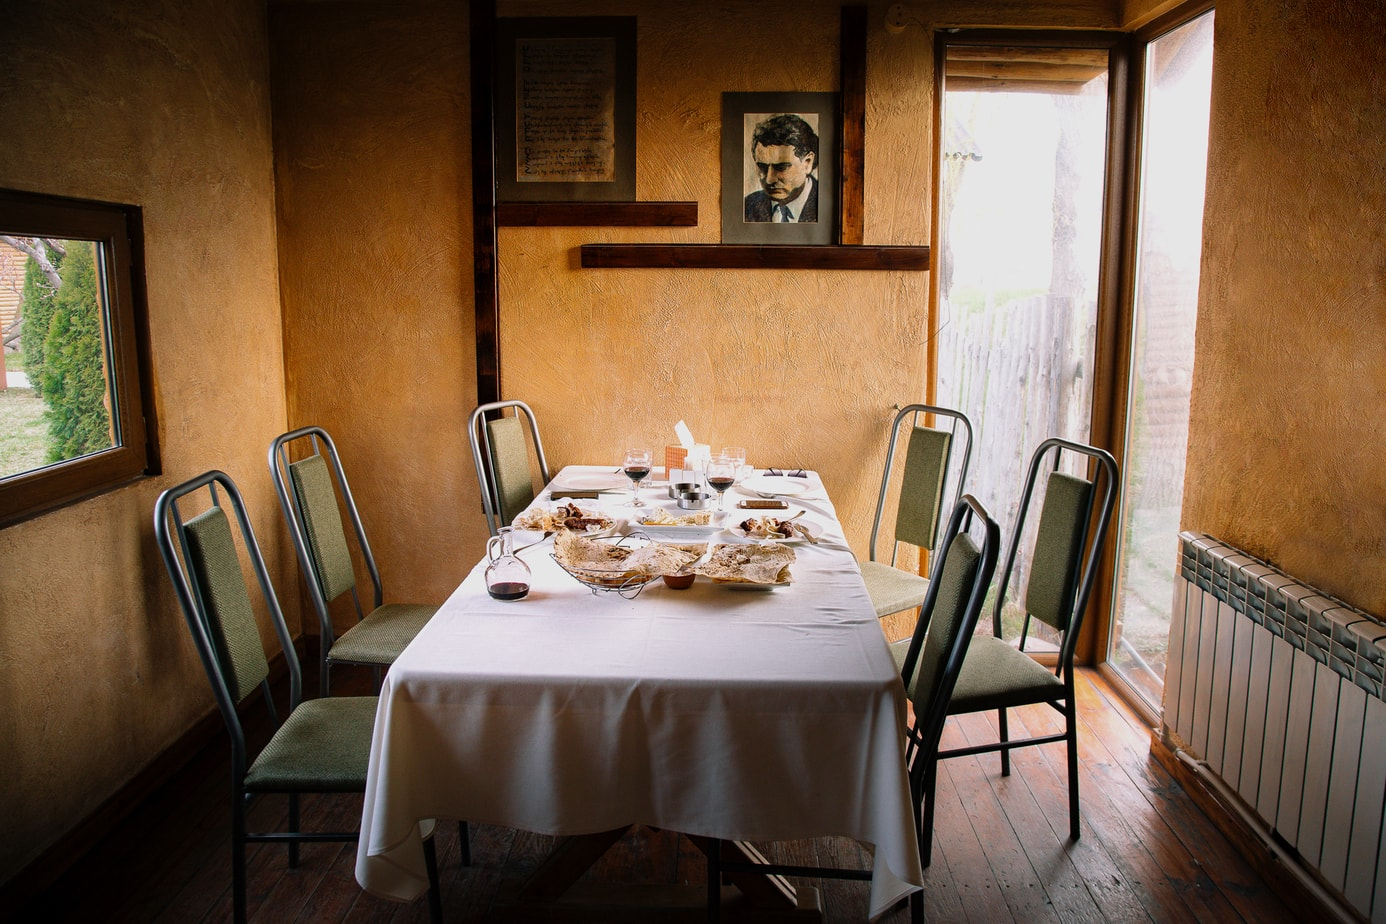 Editorial & Commercial Restaurant Photographer